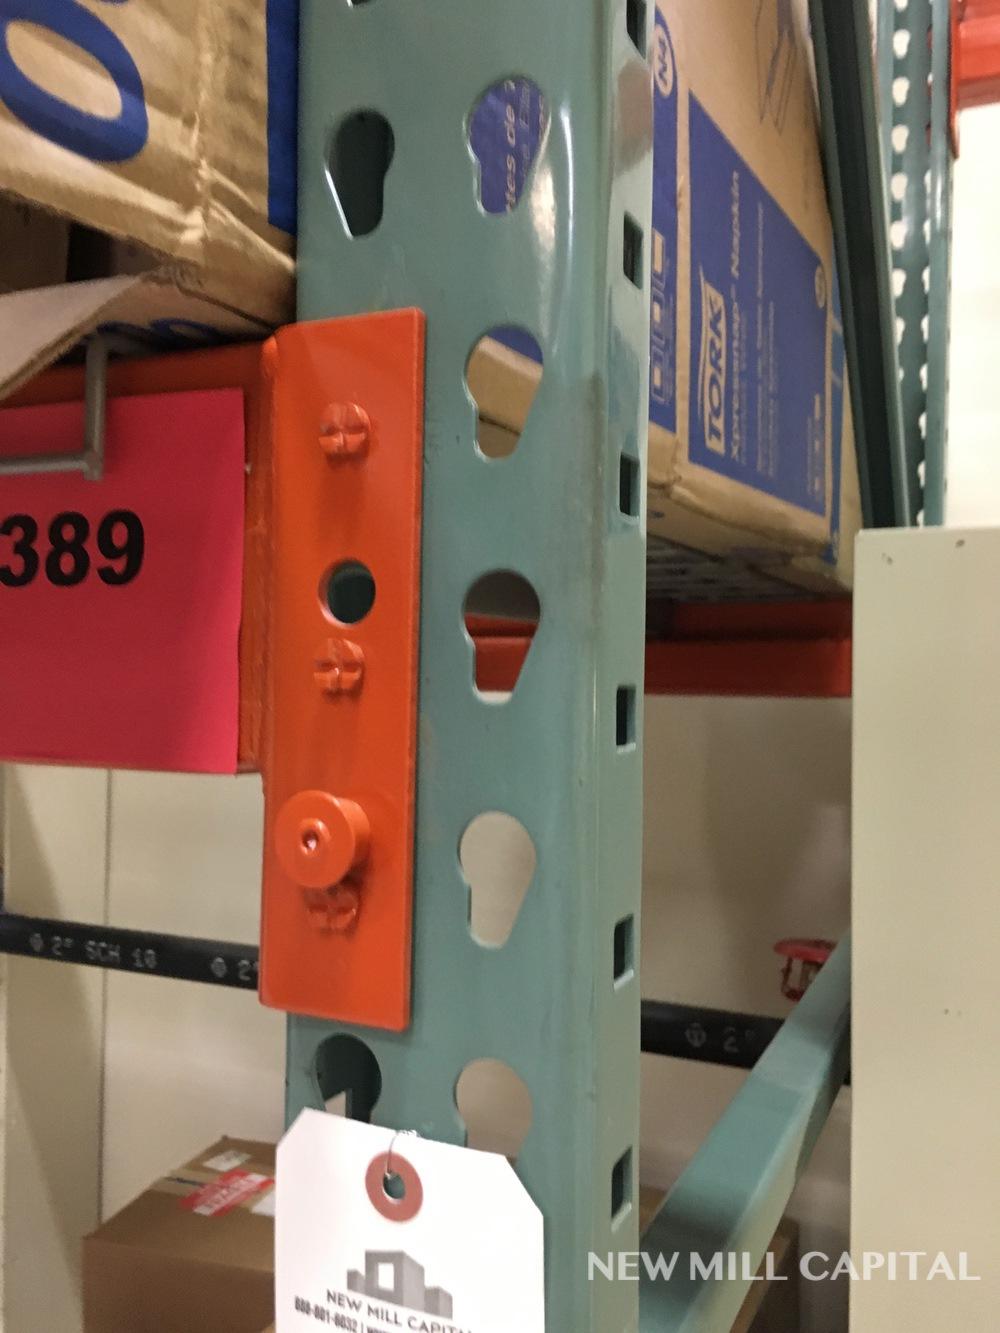 Lot 24 - Interlake Teardrop Pallet Rack, (5) Uprights (3in x 1.625in Columns, 42in | Rig: See Lot Description